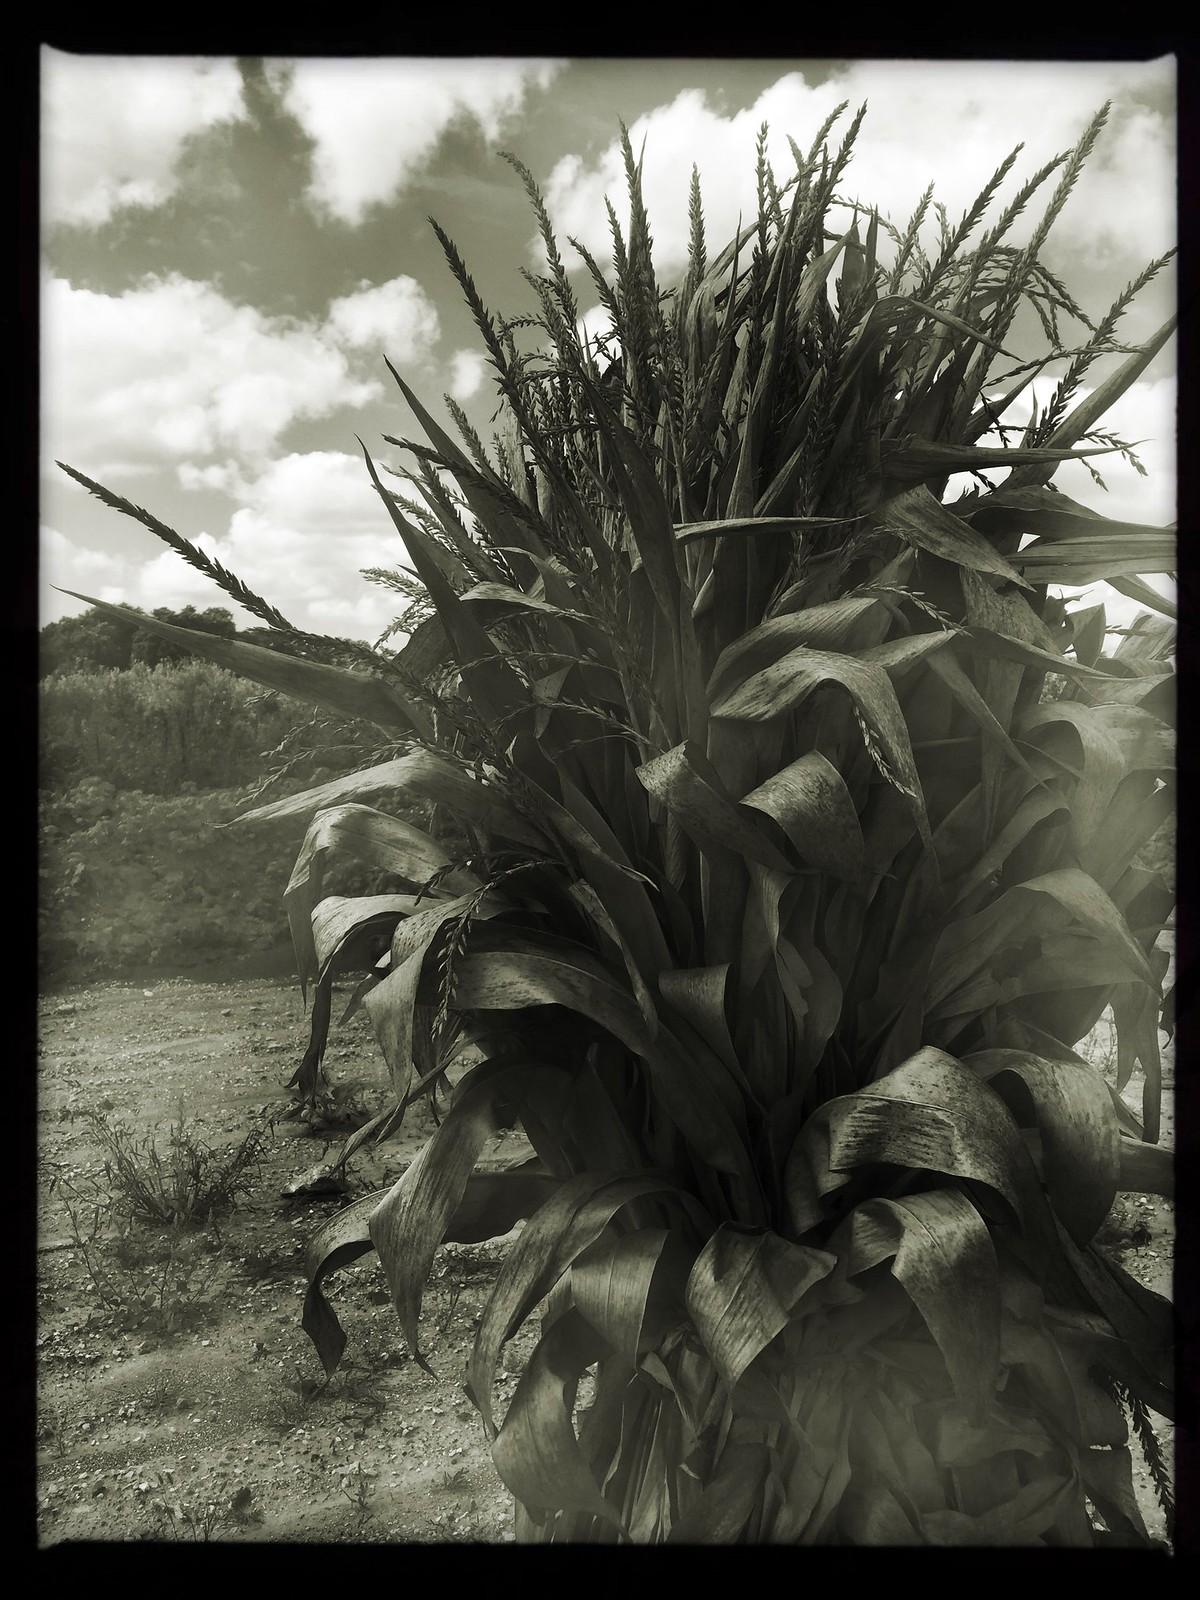 (260/366) Harvest